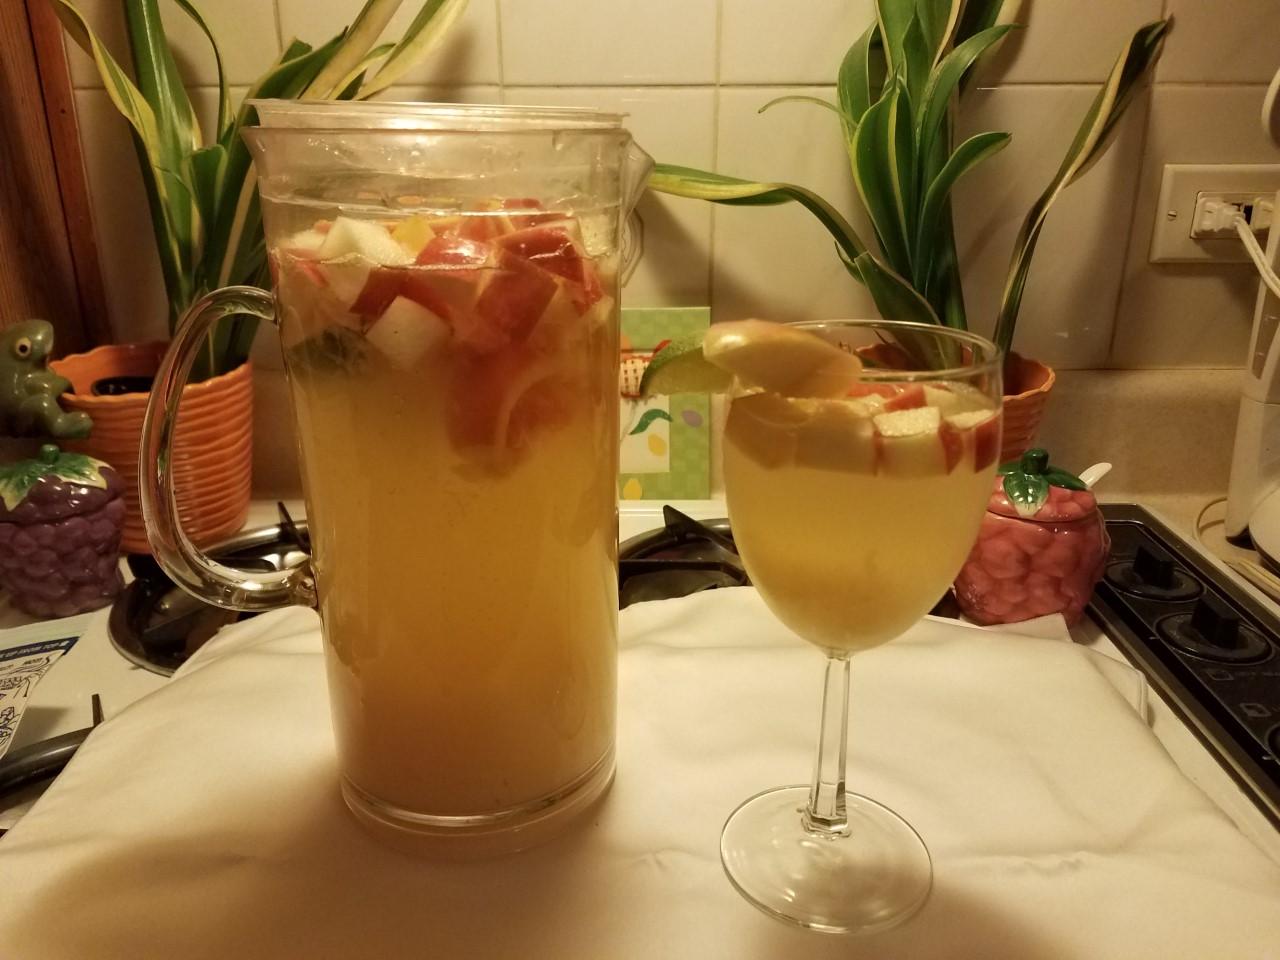 Pineapple Sangria Liz Dalton 'Lizzie'